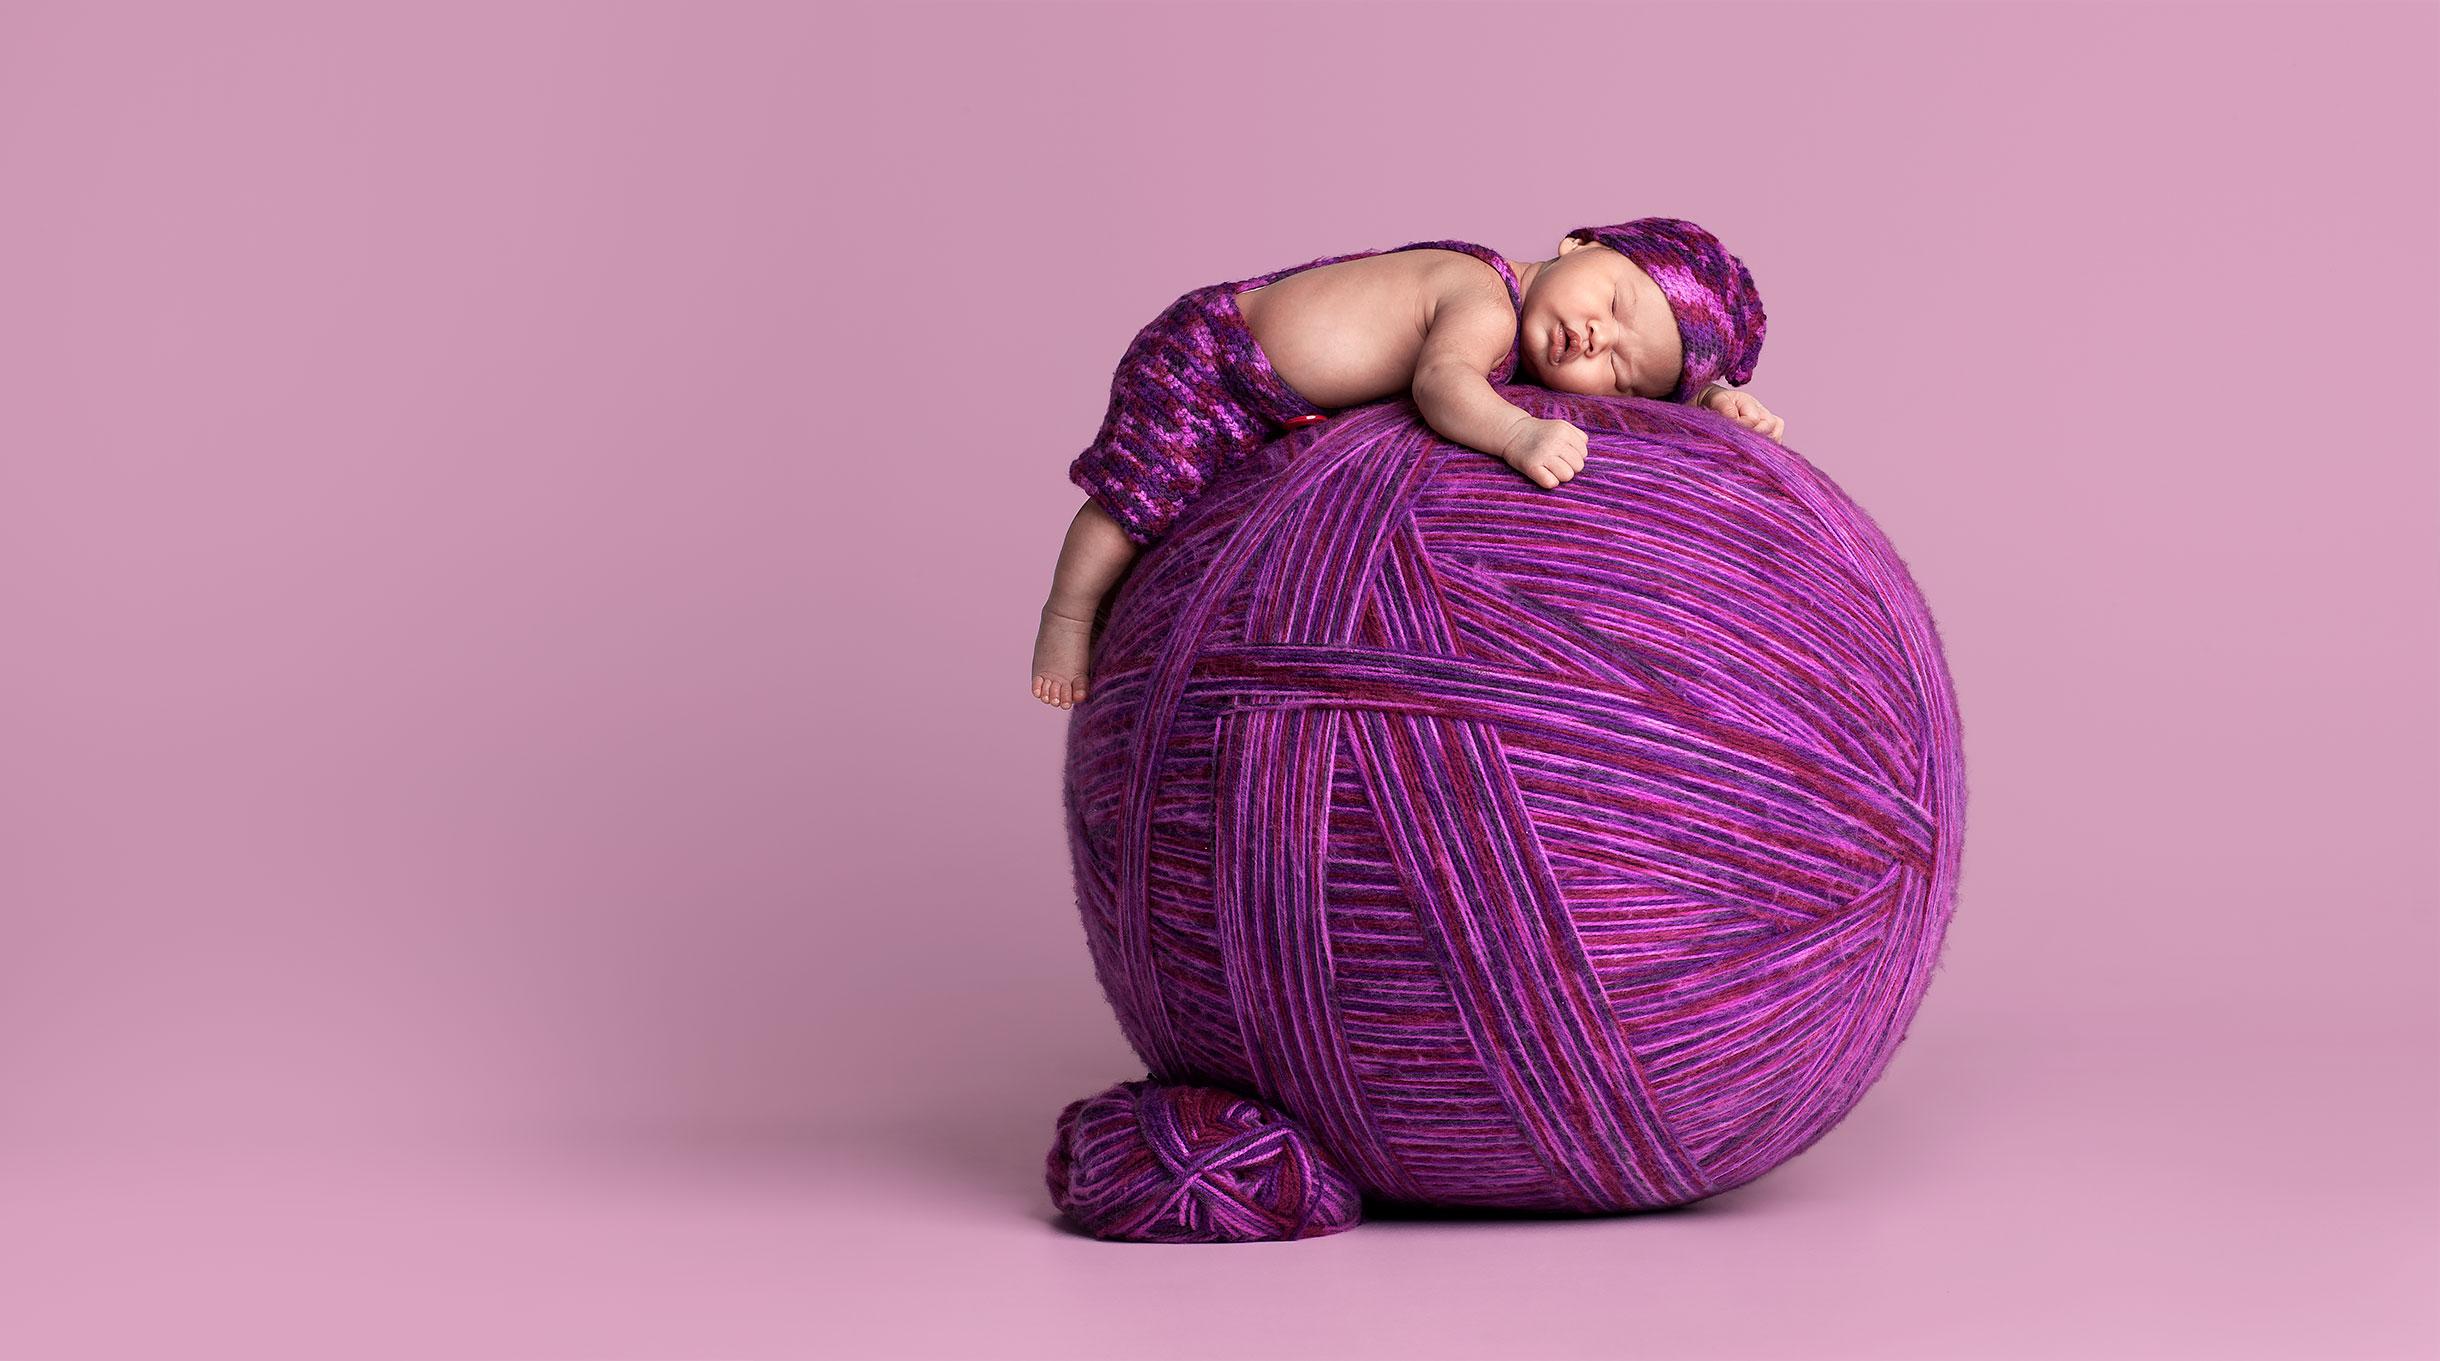 wool ball baby owen studio photographer castle hill sydney